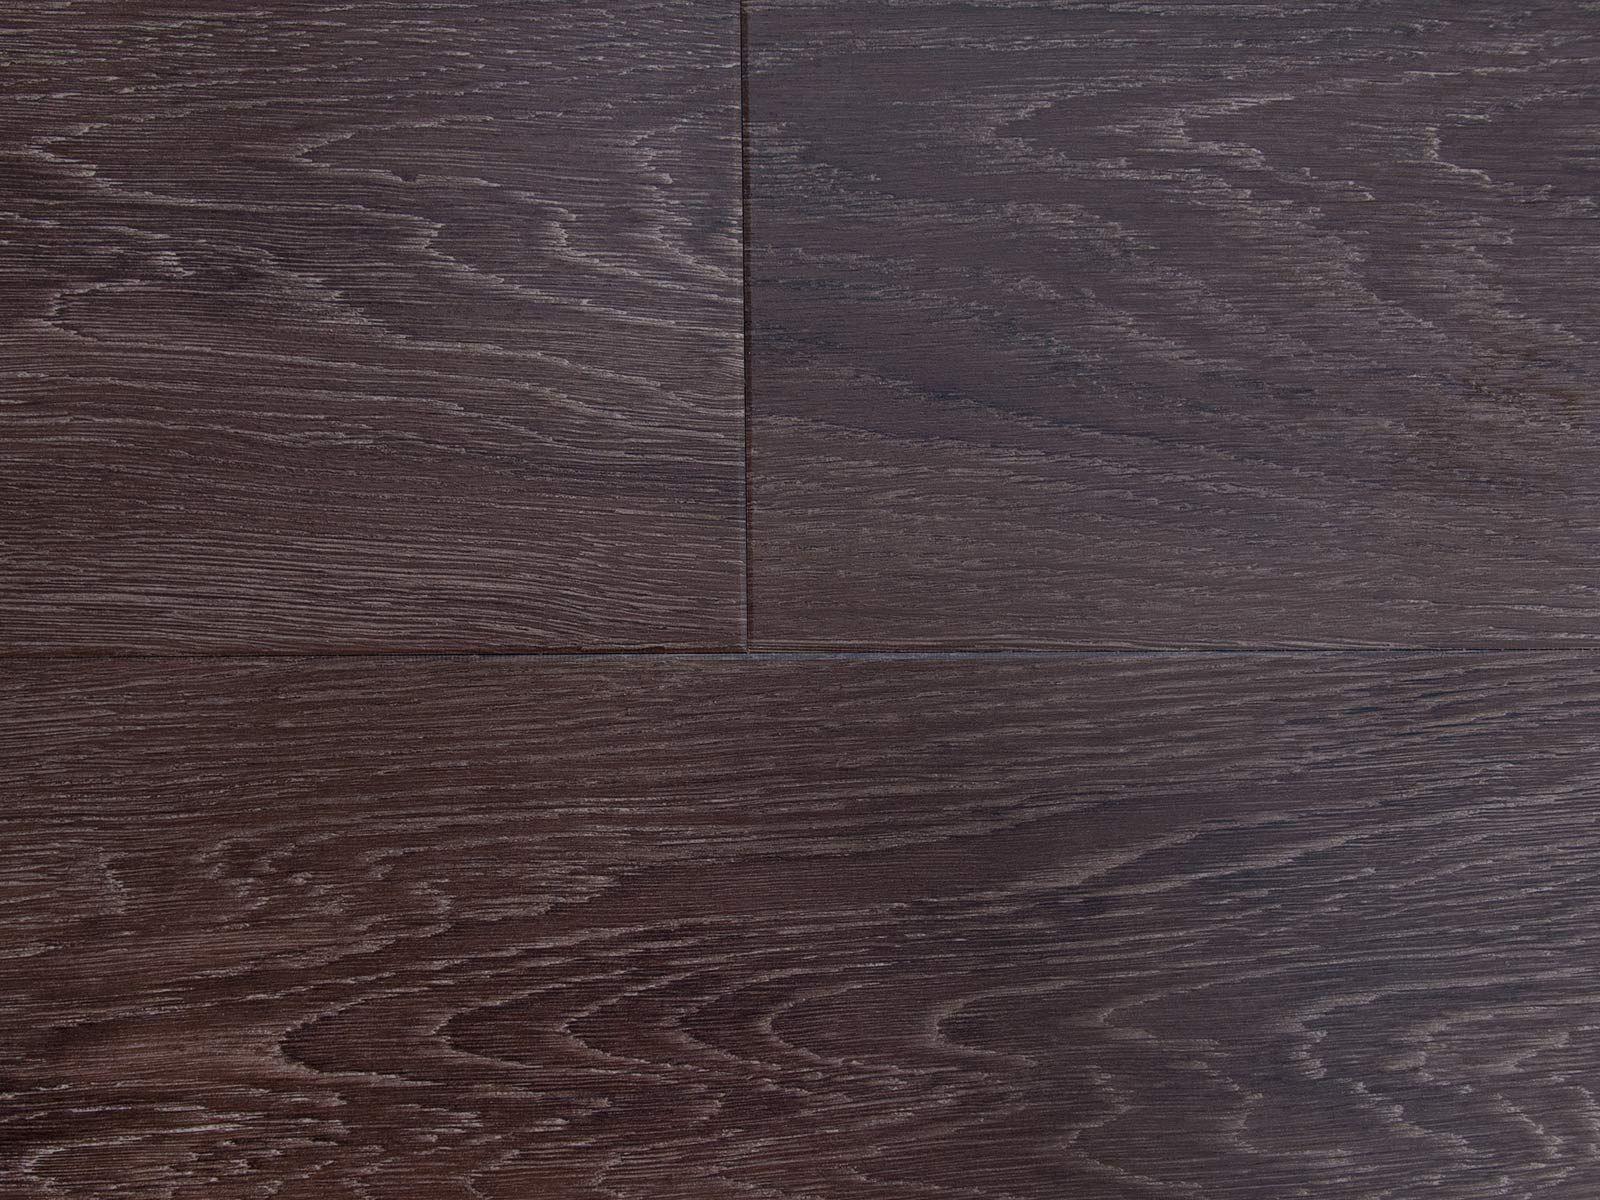 Vintage Flooring, Vintage Hardwood Floor, Reclaimed Timber Flooring - Flooring